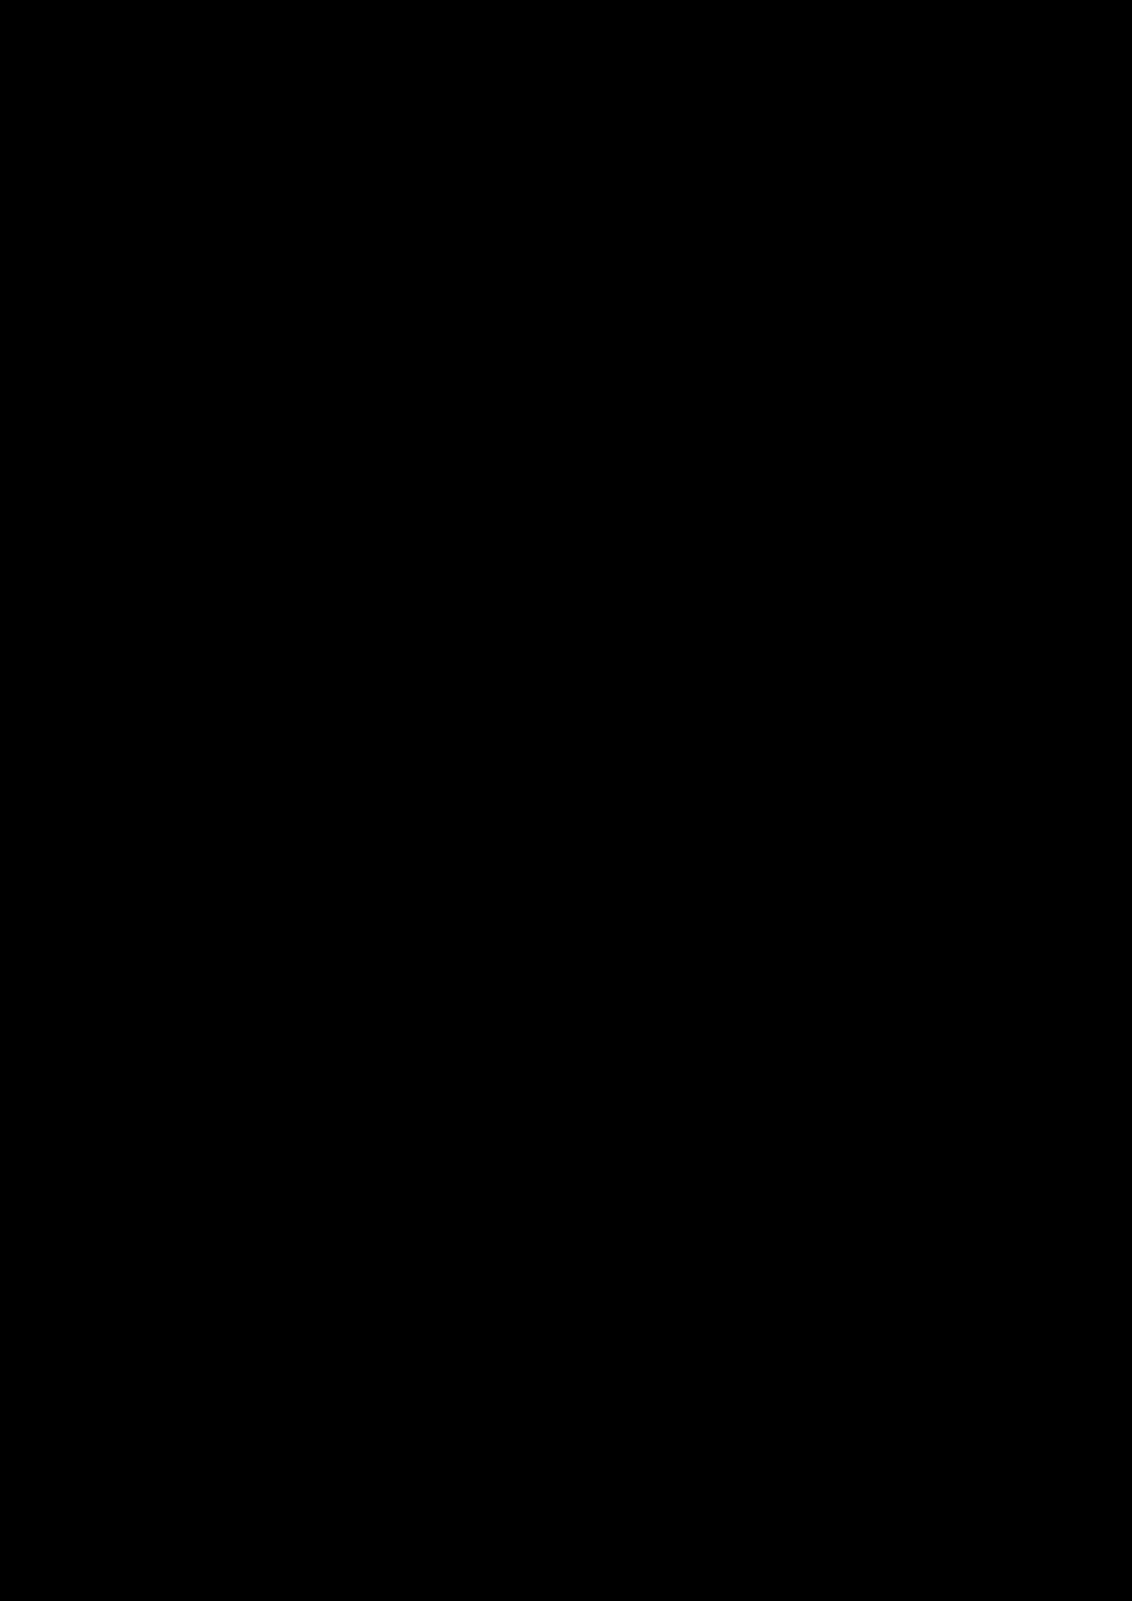 Korolevstvo slez slide, Image 25